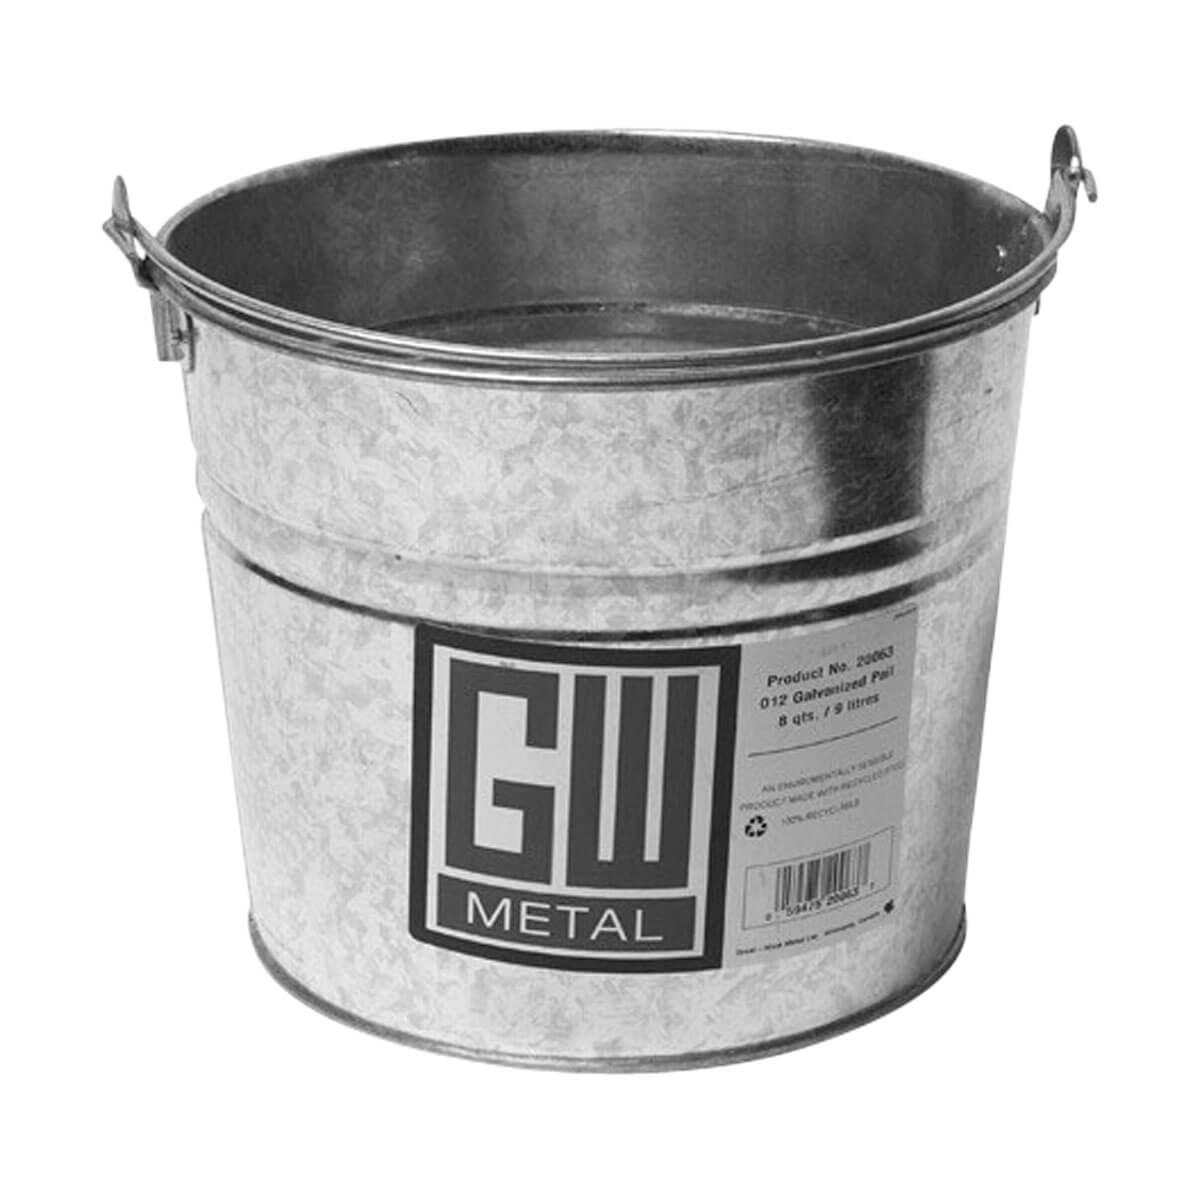 GW Metal Galvanized Pail - 14 qt